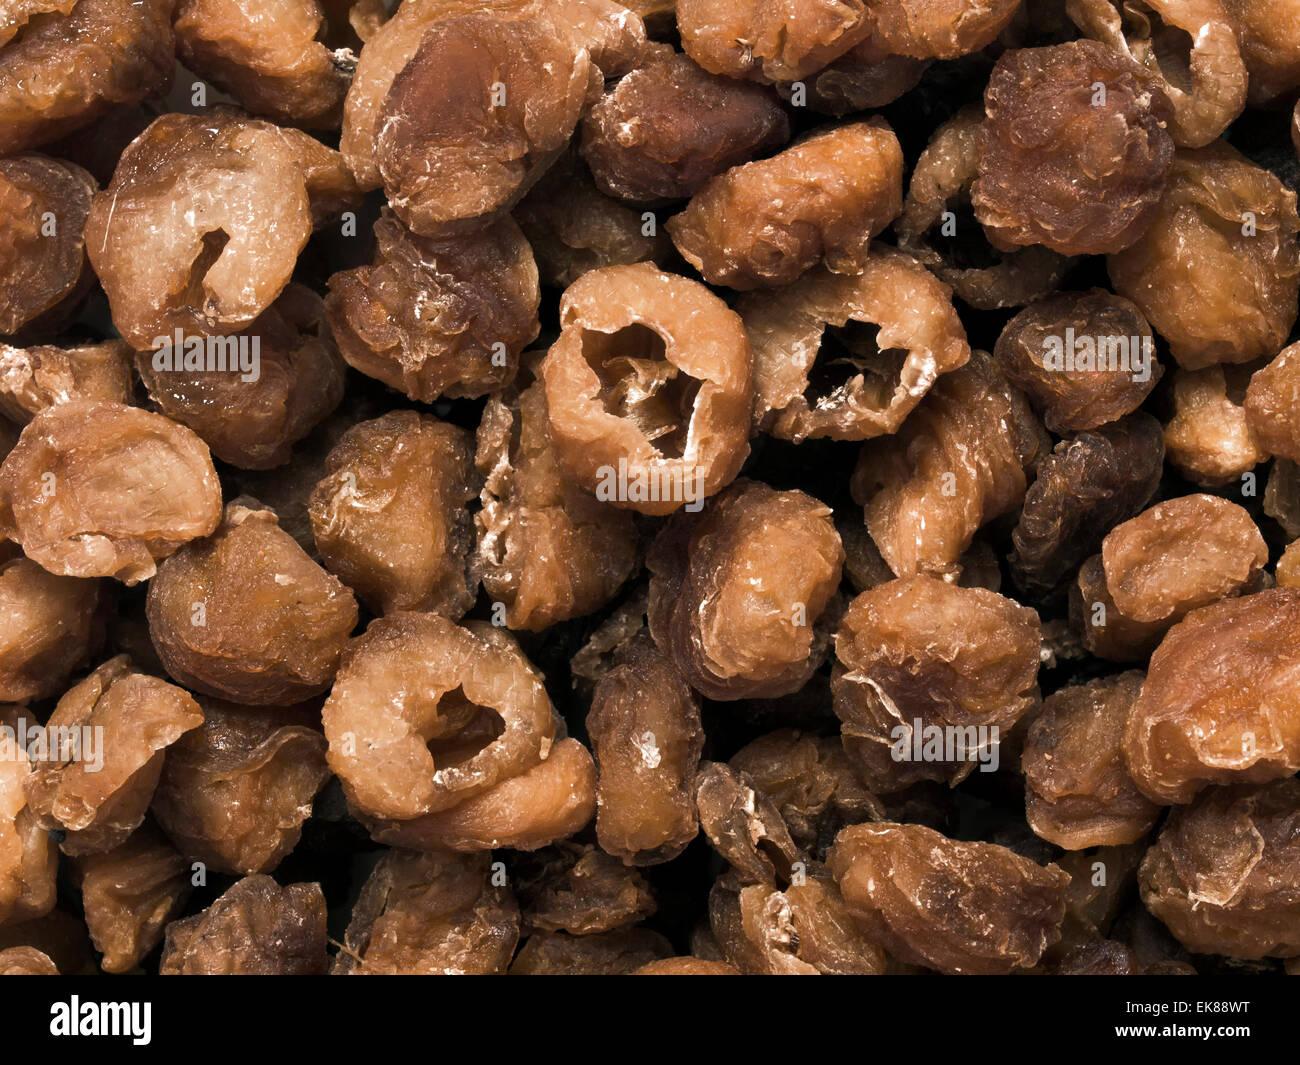 Dried longan fruit